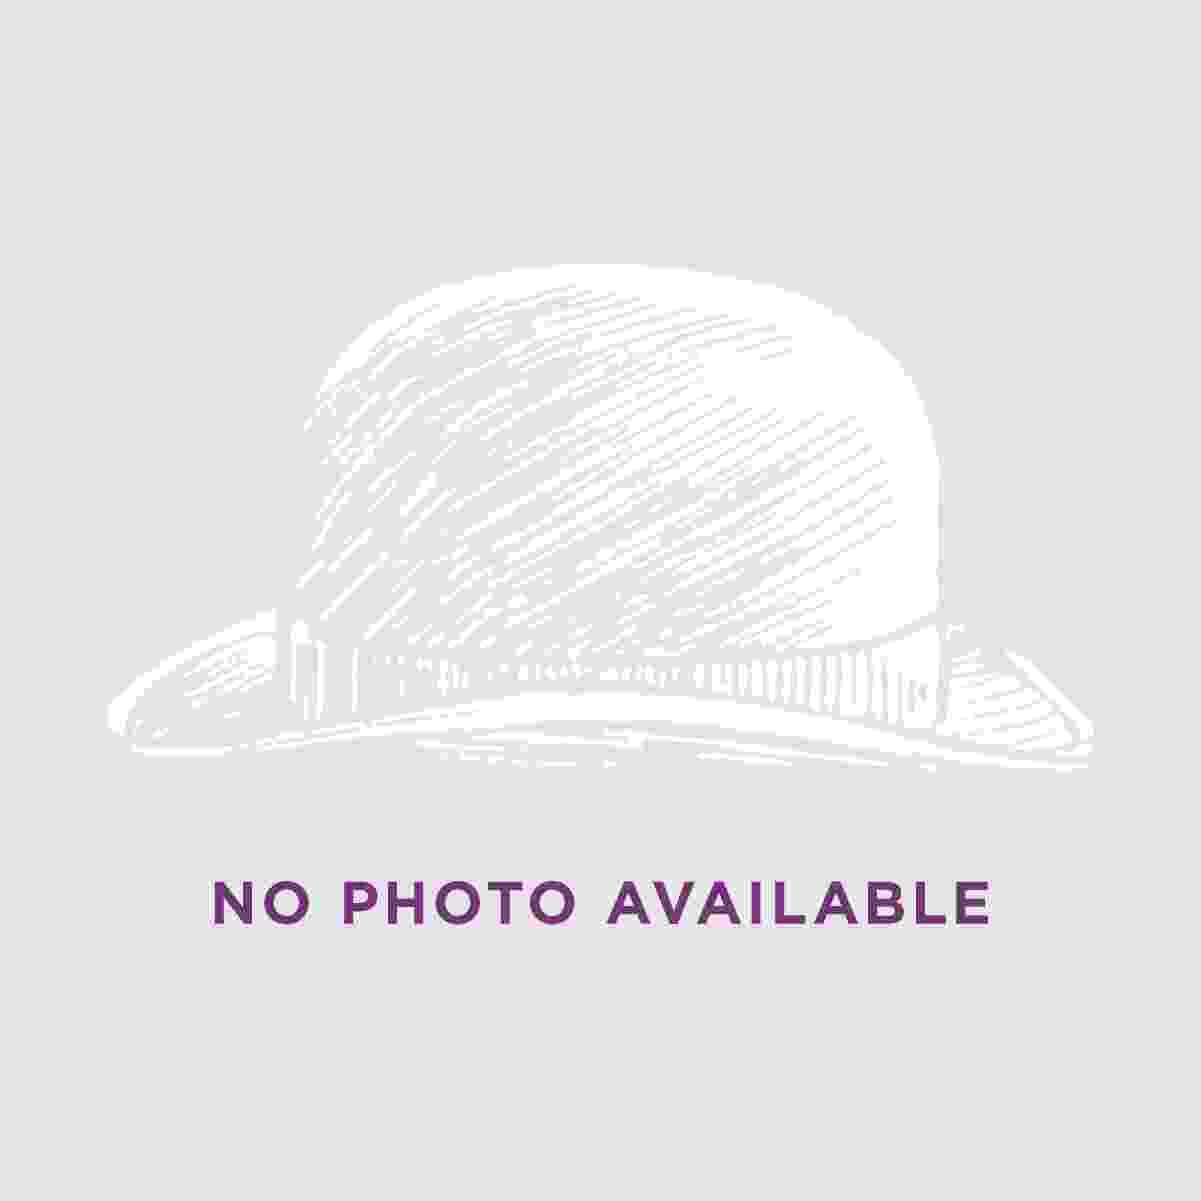 Baskerville Hat Company Merripit Houndstooth Italian Wool Ivy Cap